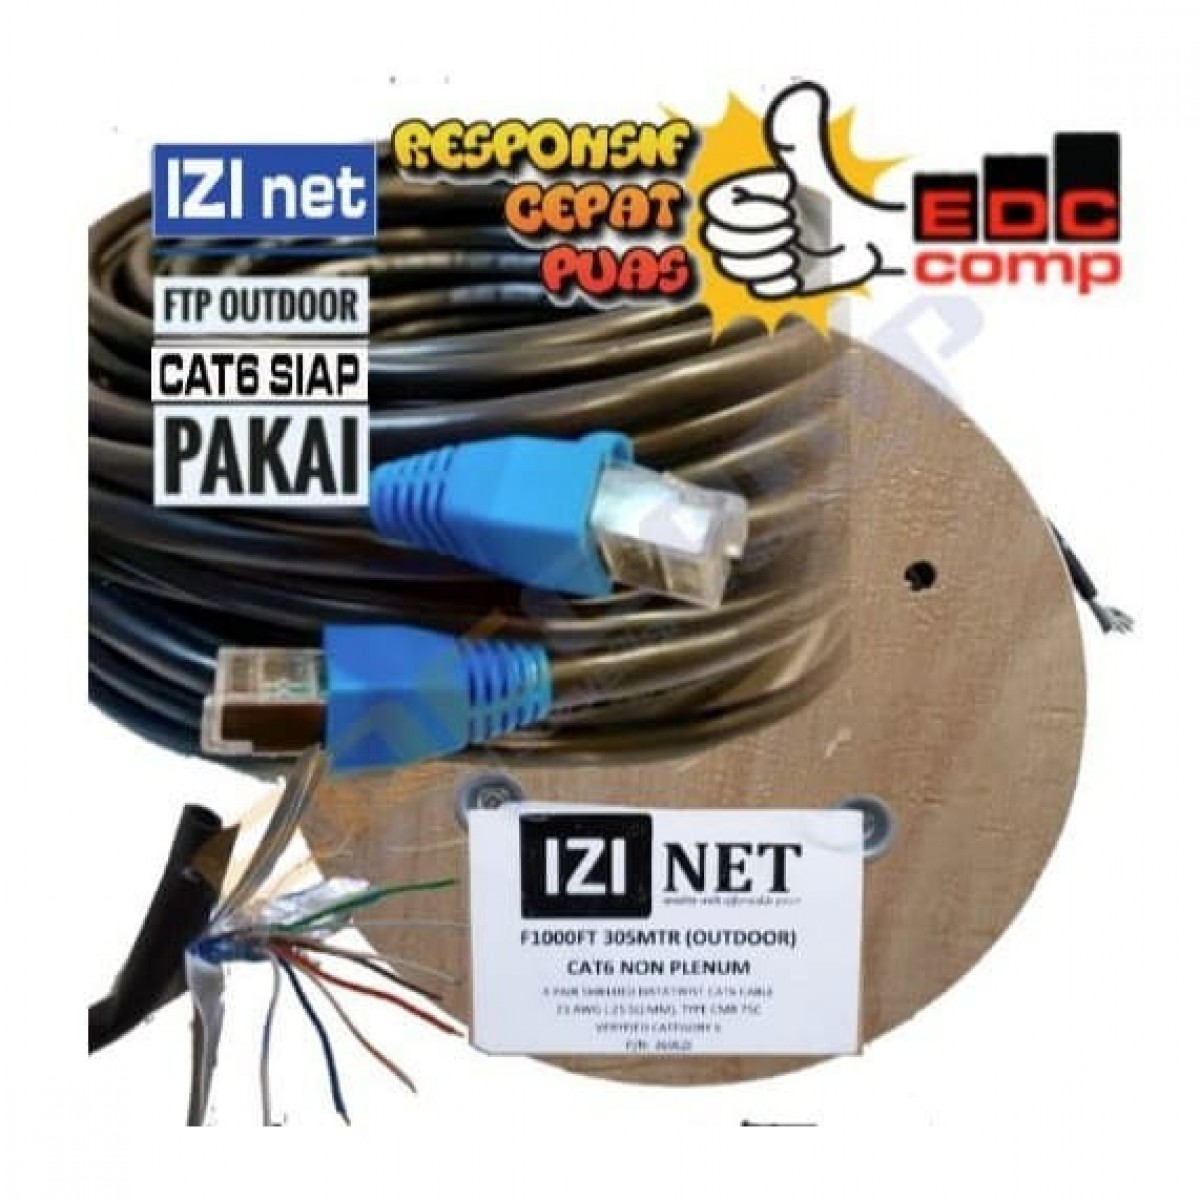 Cable STP/FTP Cat 5e Outdoor Cable 100 Meter IZI net Original - EdcComp